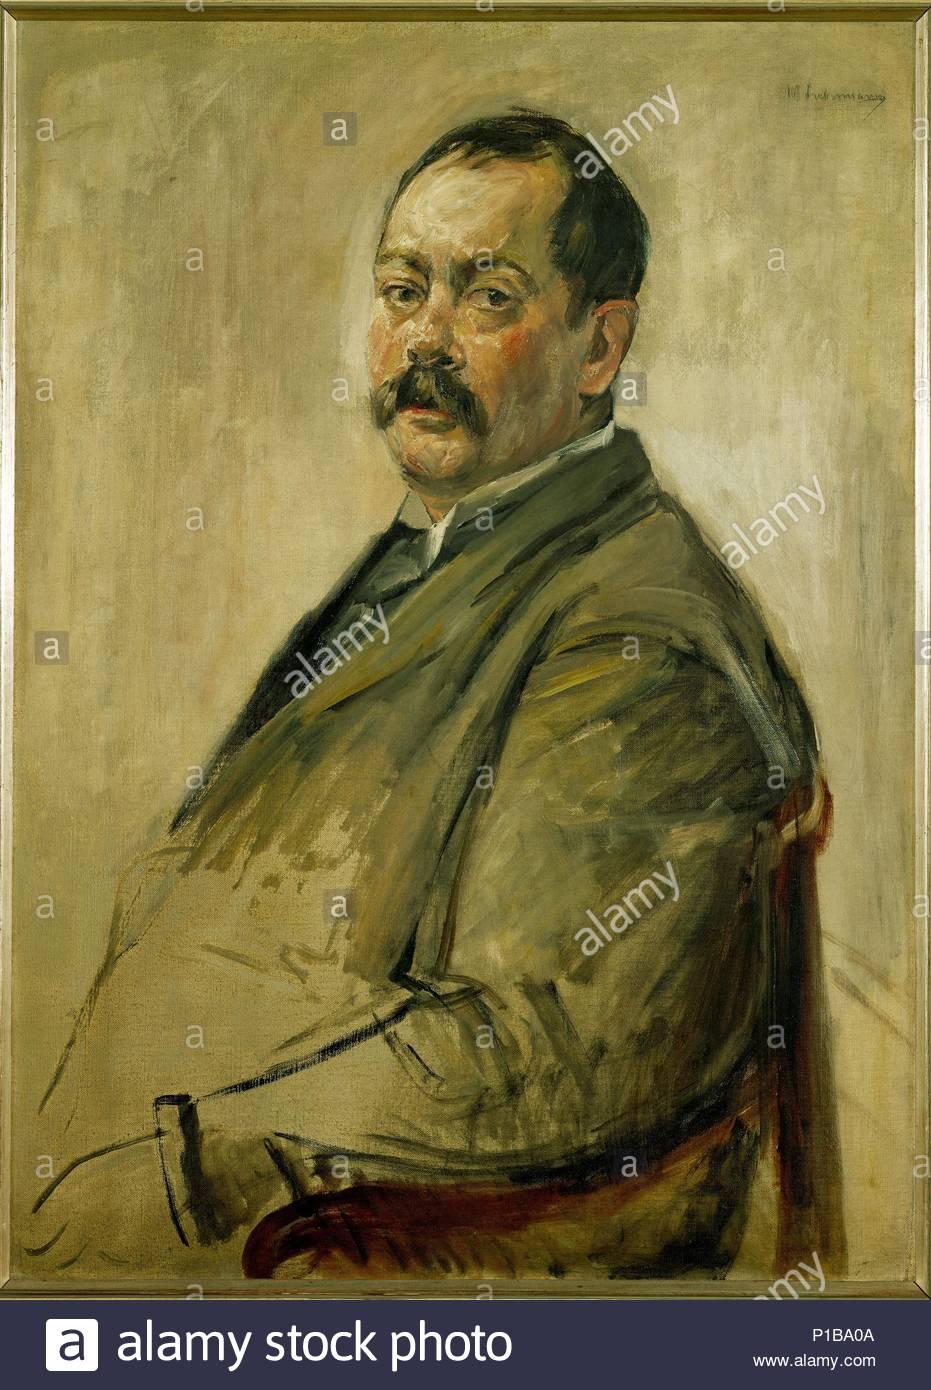 Portrait of painter Lovis Corinth (1858-1925). 1899. Canvas, 88 x 63 cm. Author: Max Liebermann (1847-1935). Location: Deutsche Bank AG, Frankfurt / Main, Germany. - Stock Image